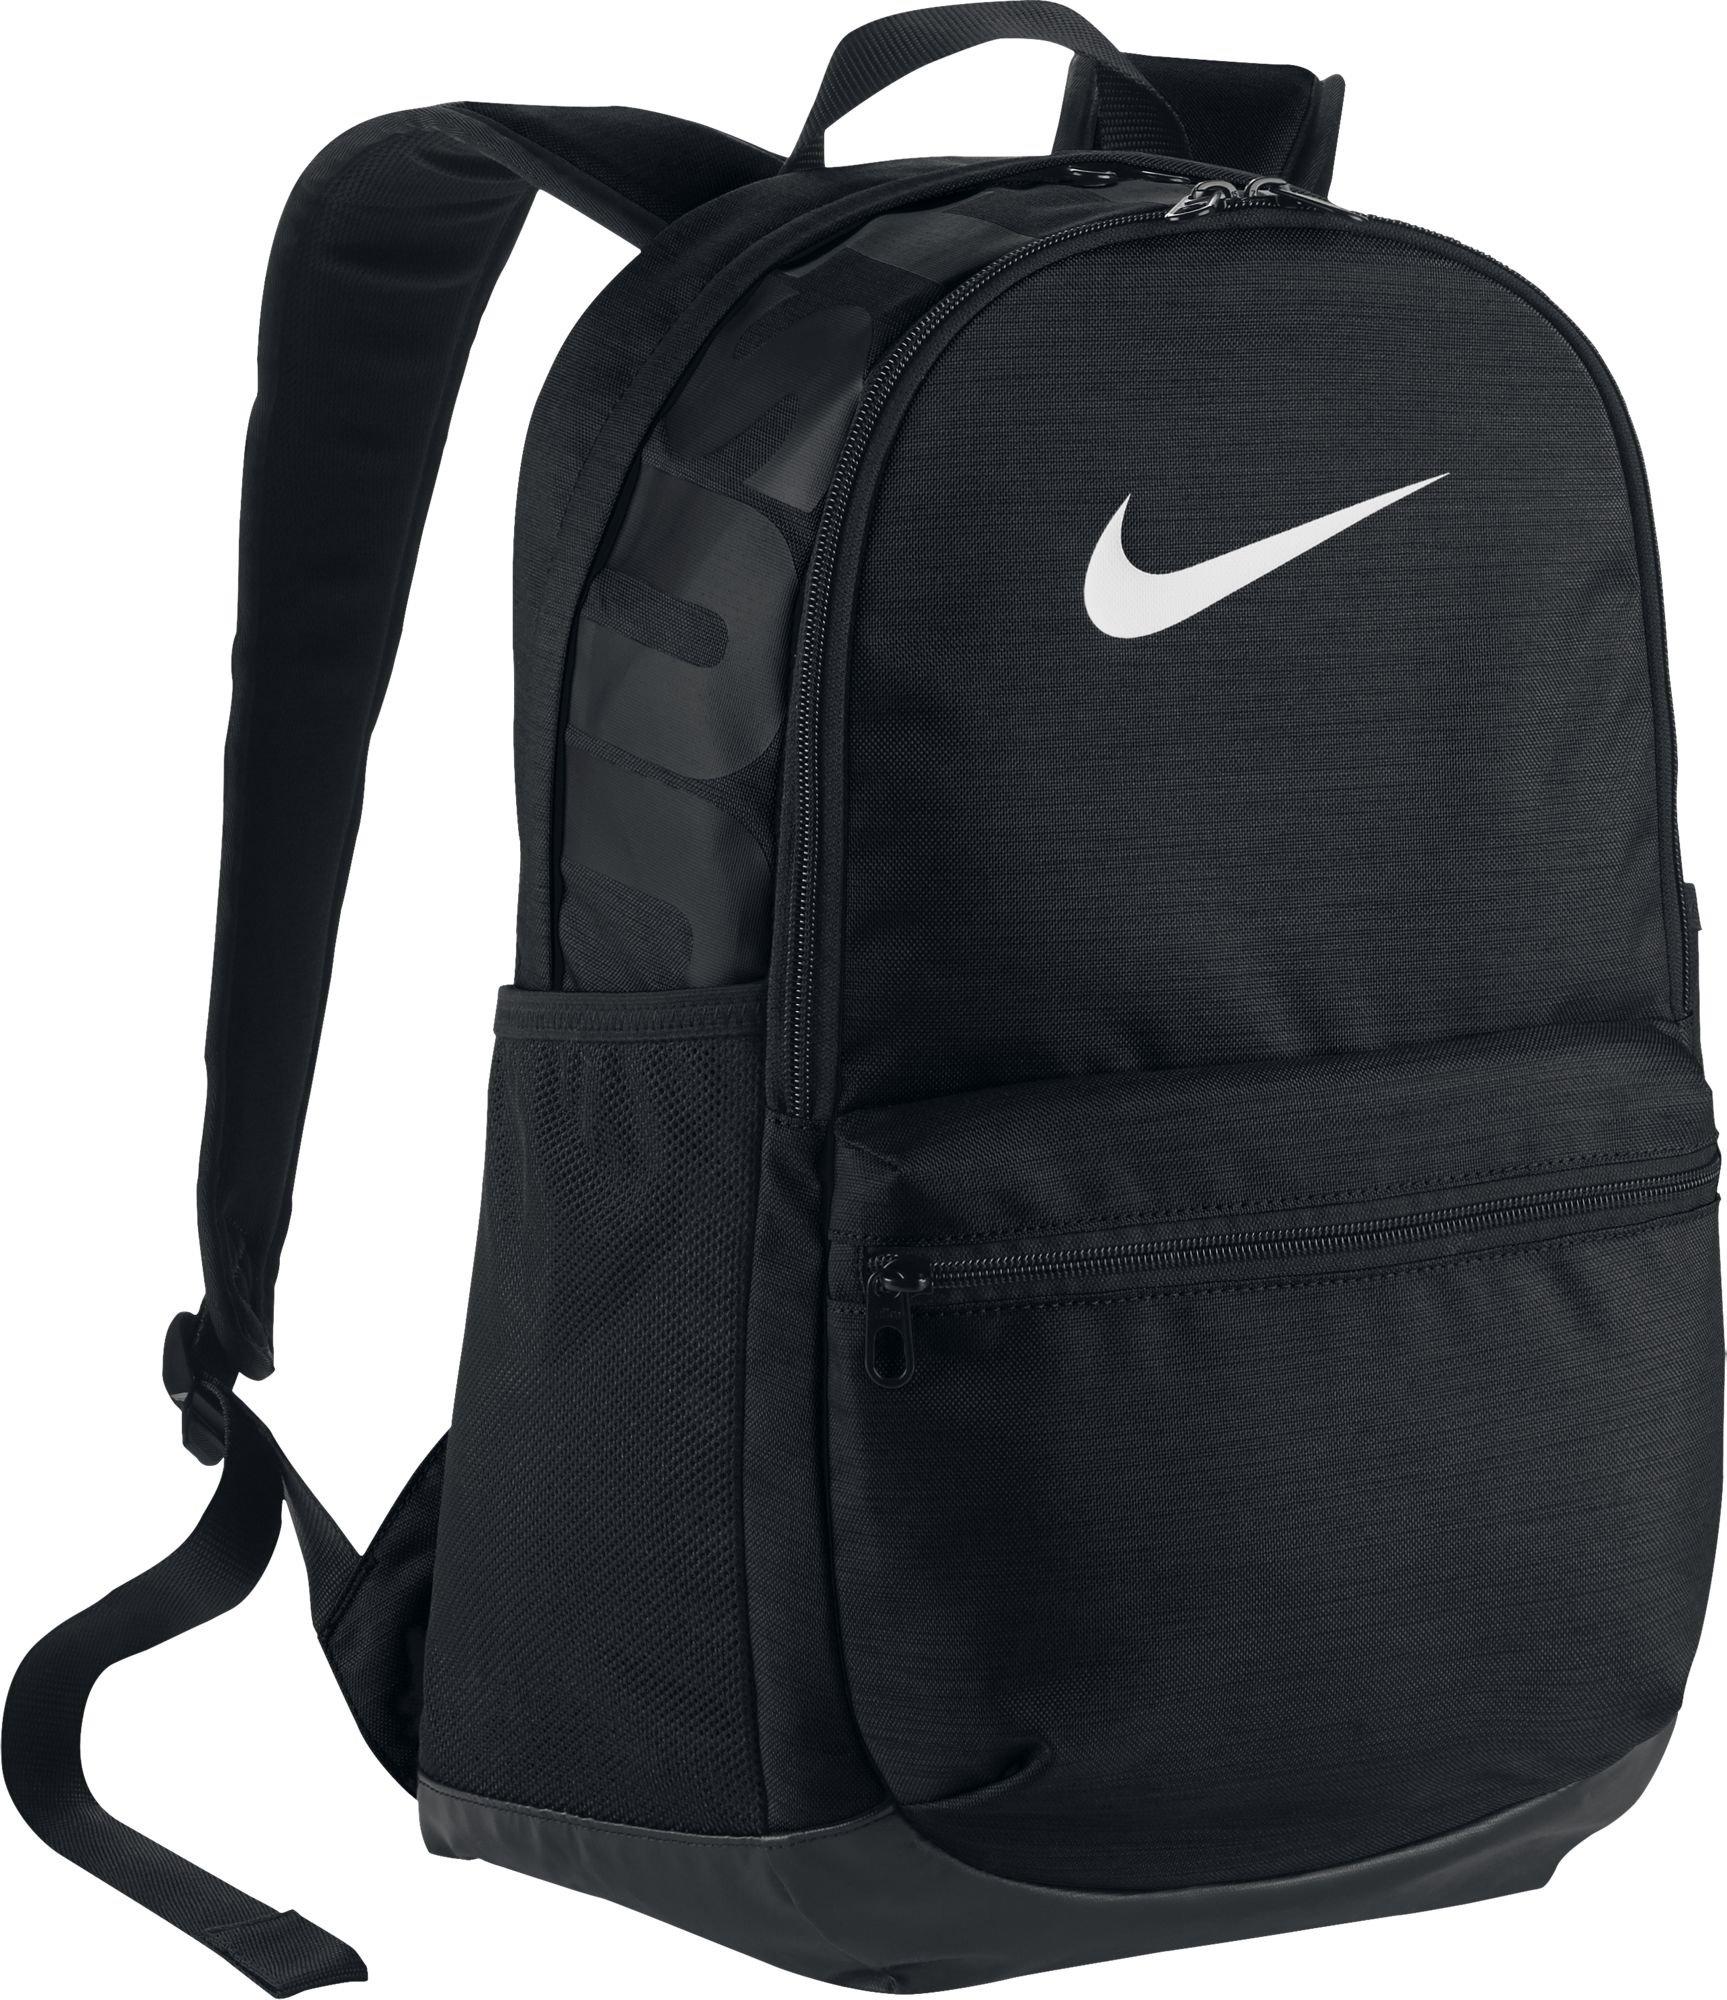 Online M Brsla Nk MochilaHombreMochilas Bkpk Escolares Nike doBeCrx